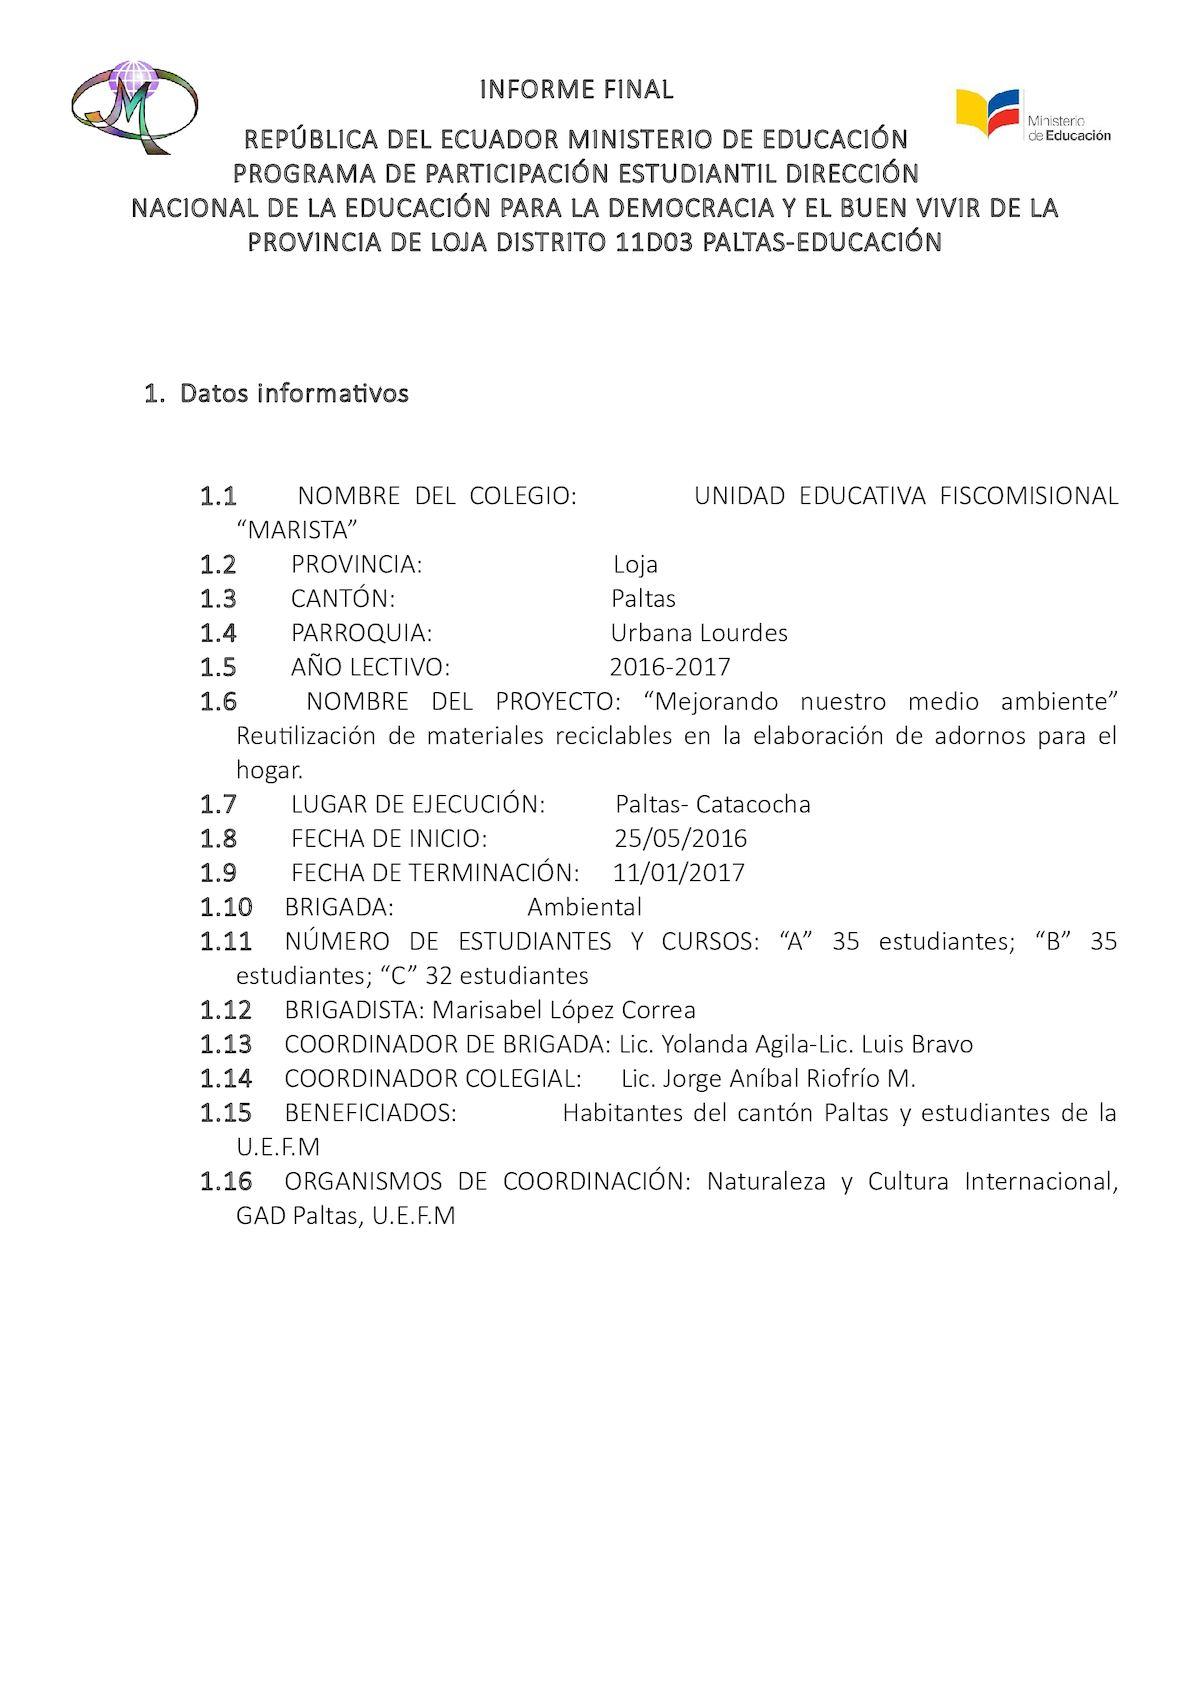 Calaméo - Informe Final De Participacion Estudiantil